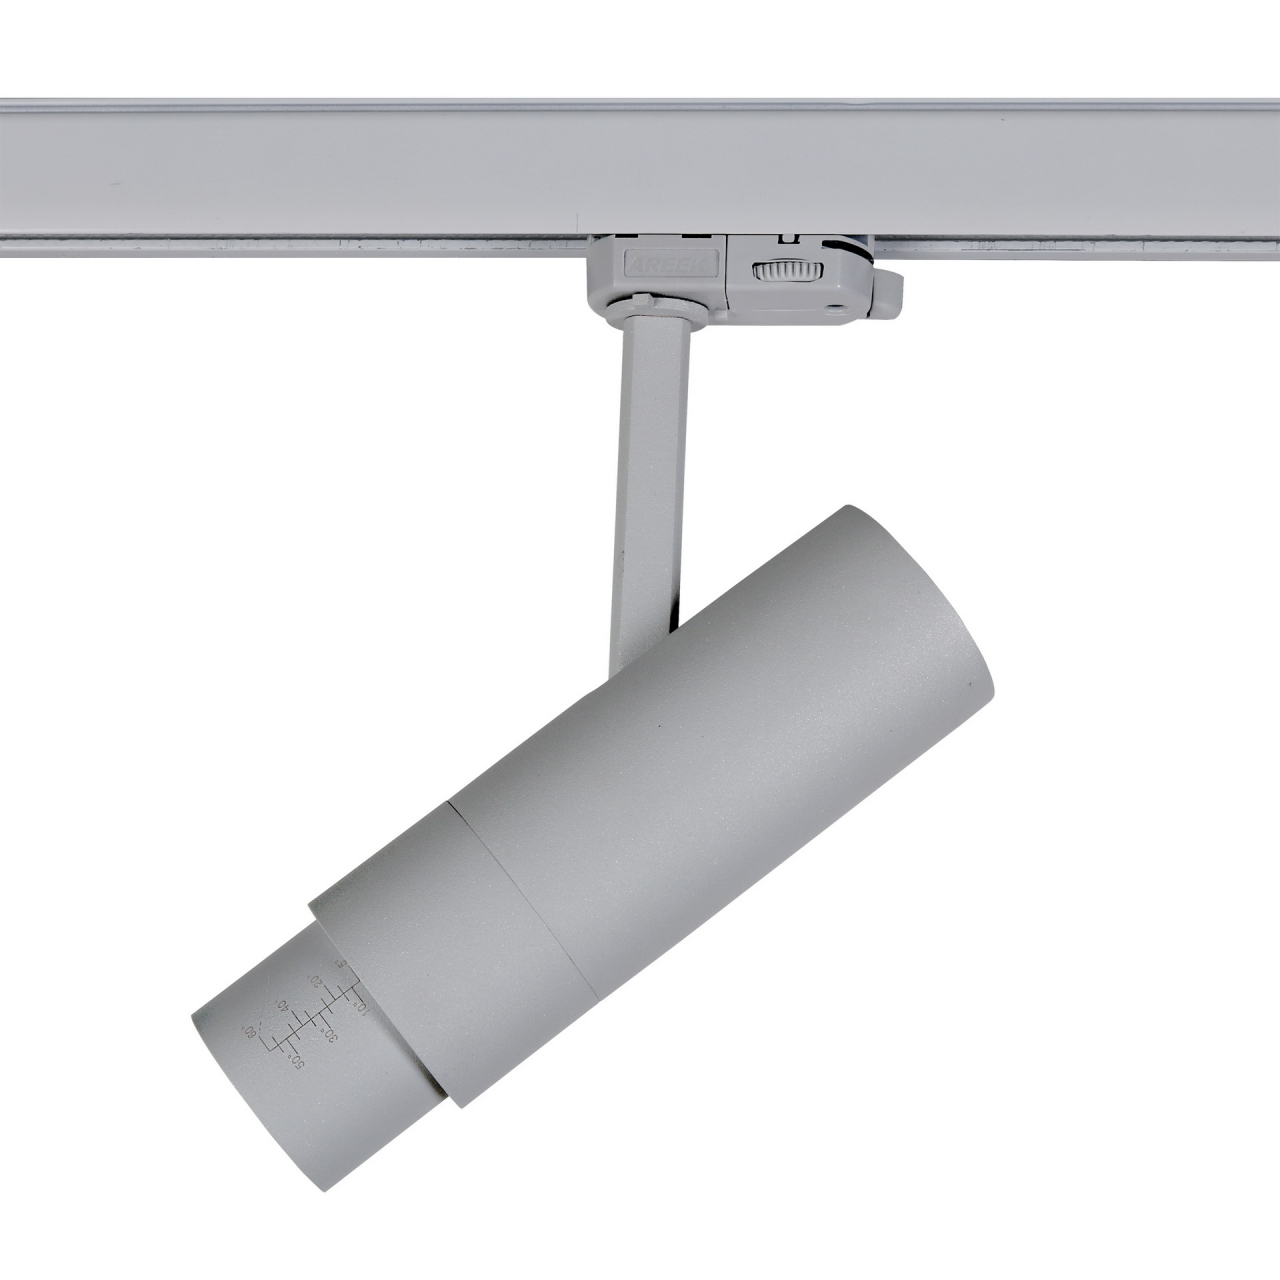 Светильник для 3-фазного трека FUOCO LED 15W 950LM 5-60G Серый 3000K IP20 Lightstar 215439